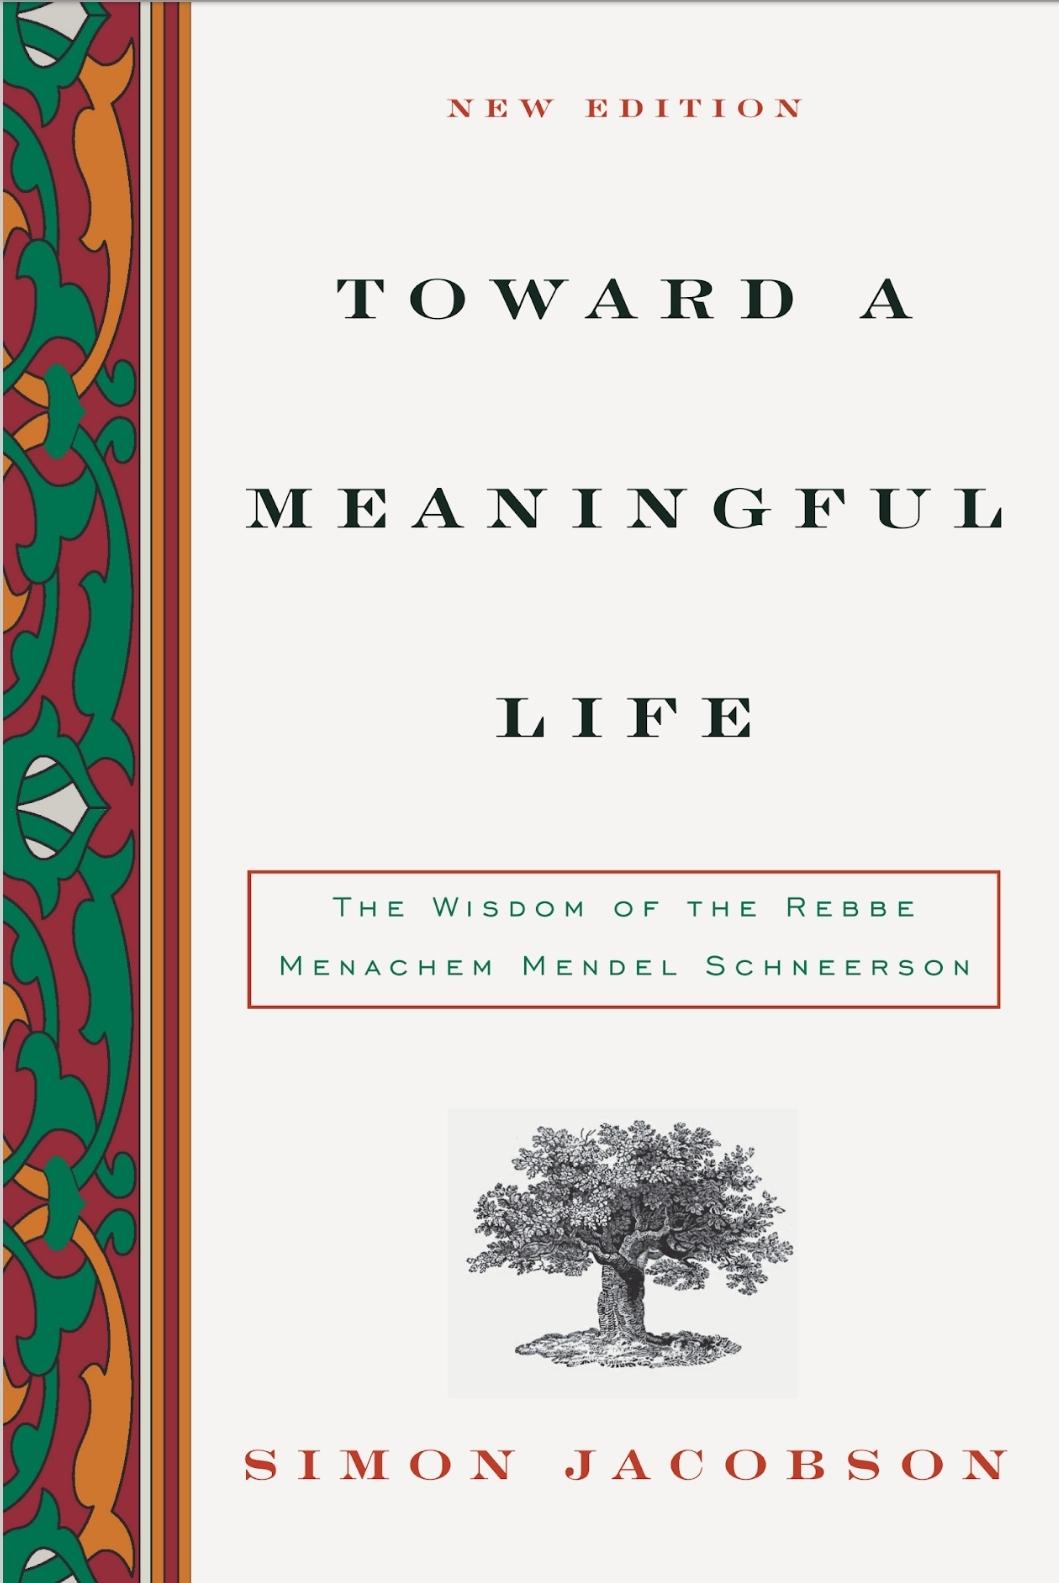 towards a meaningful life.jpg